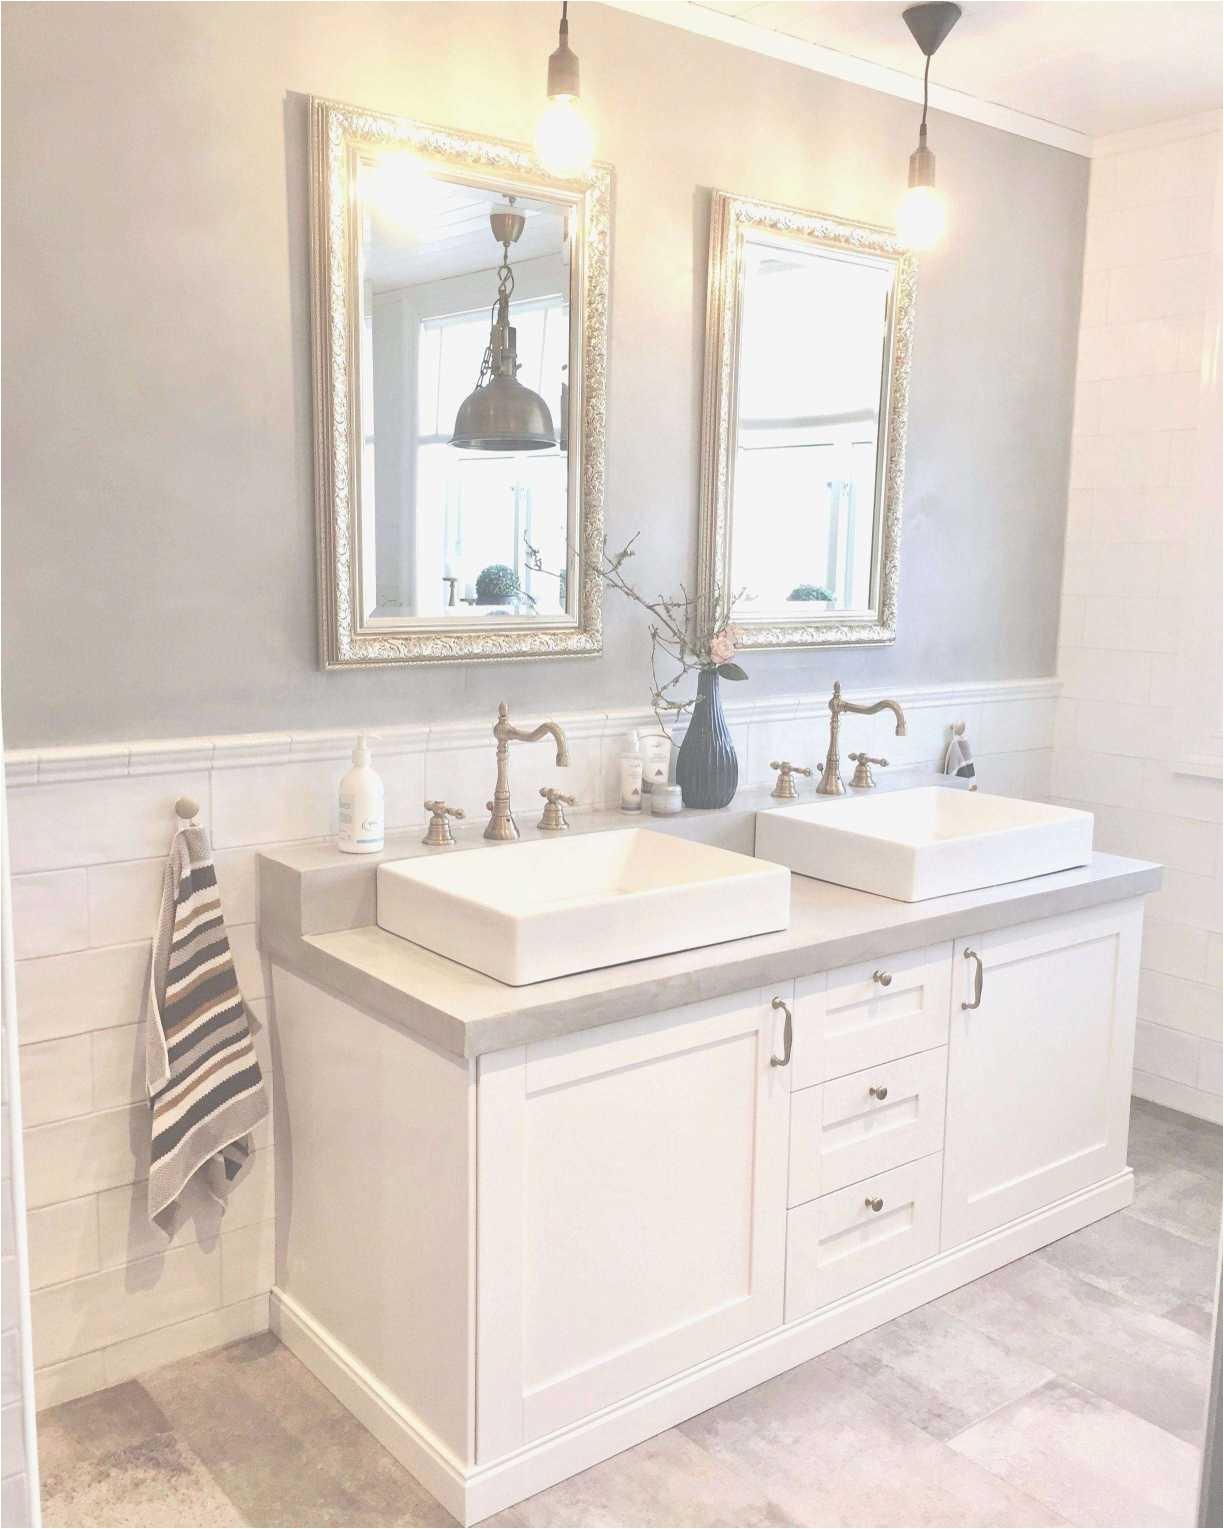 Bathroom Jacuzzi Design Ideas where to Find Jacuzzi Bathtub Motor